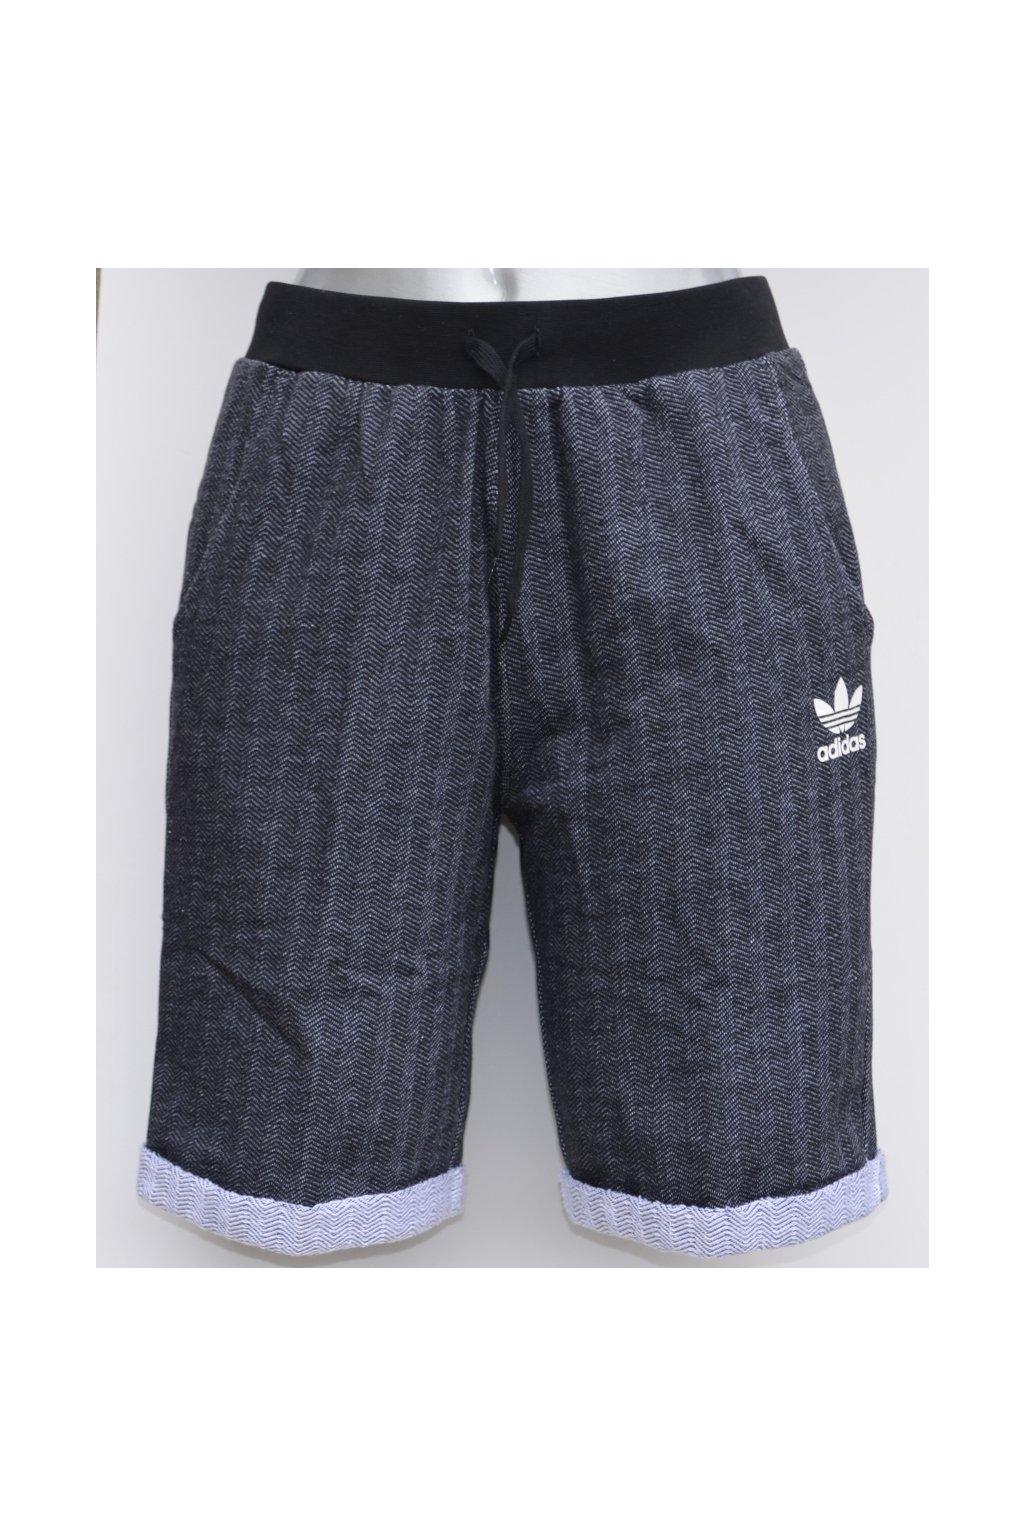 BK2027 šortky adidas originals f